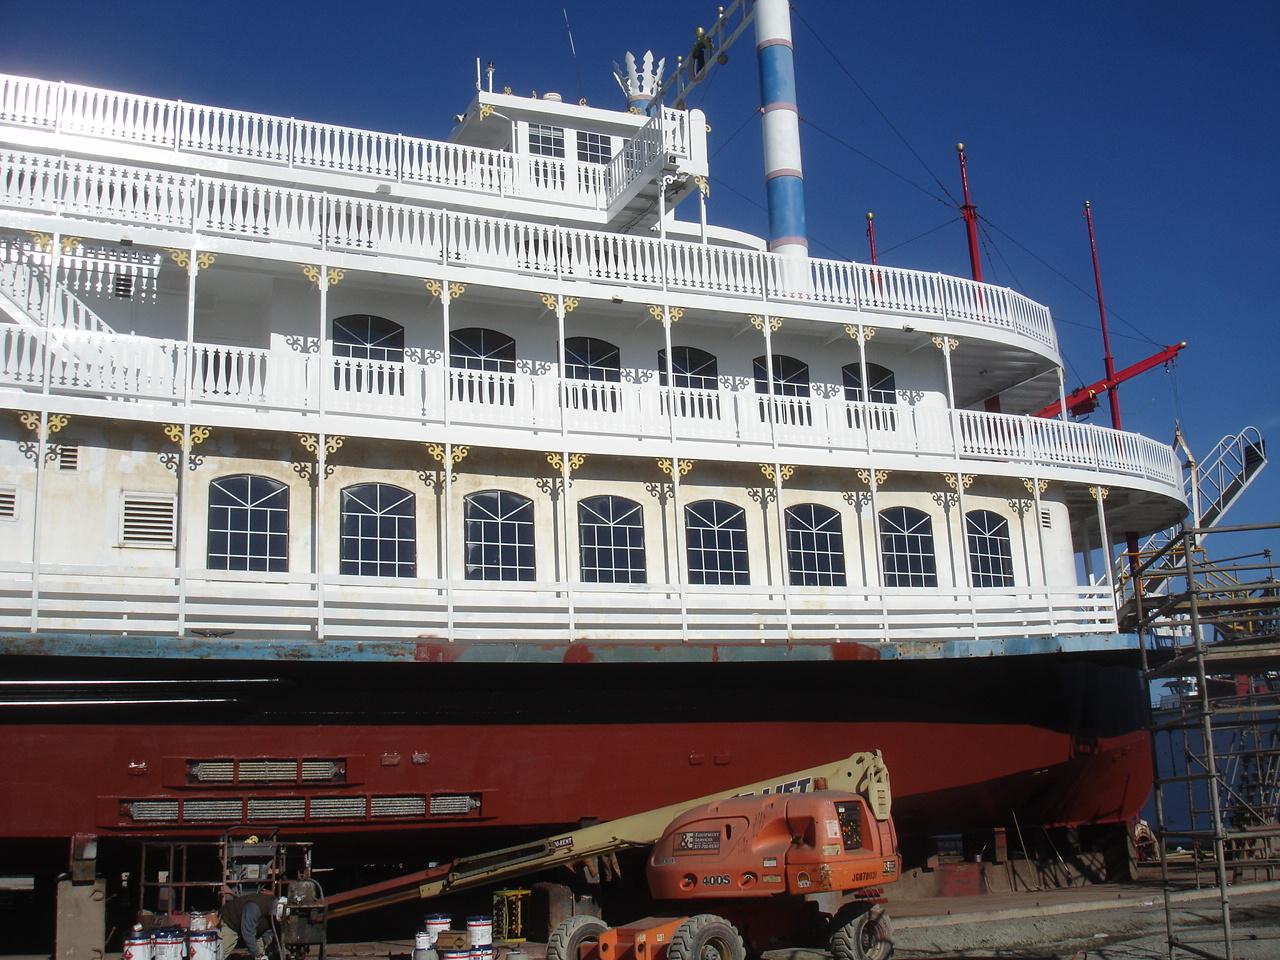 MV Liberty Belle